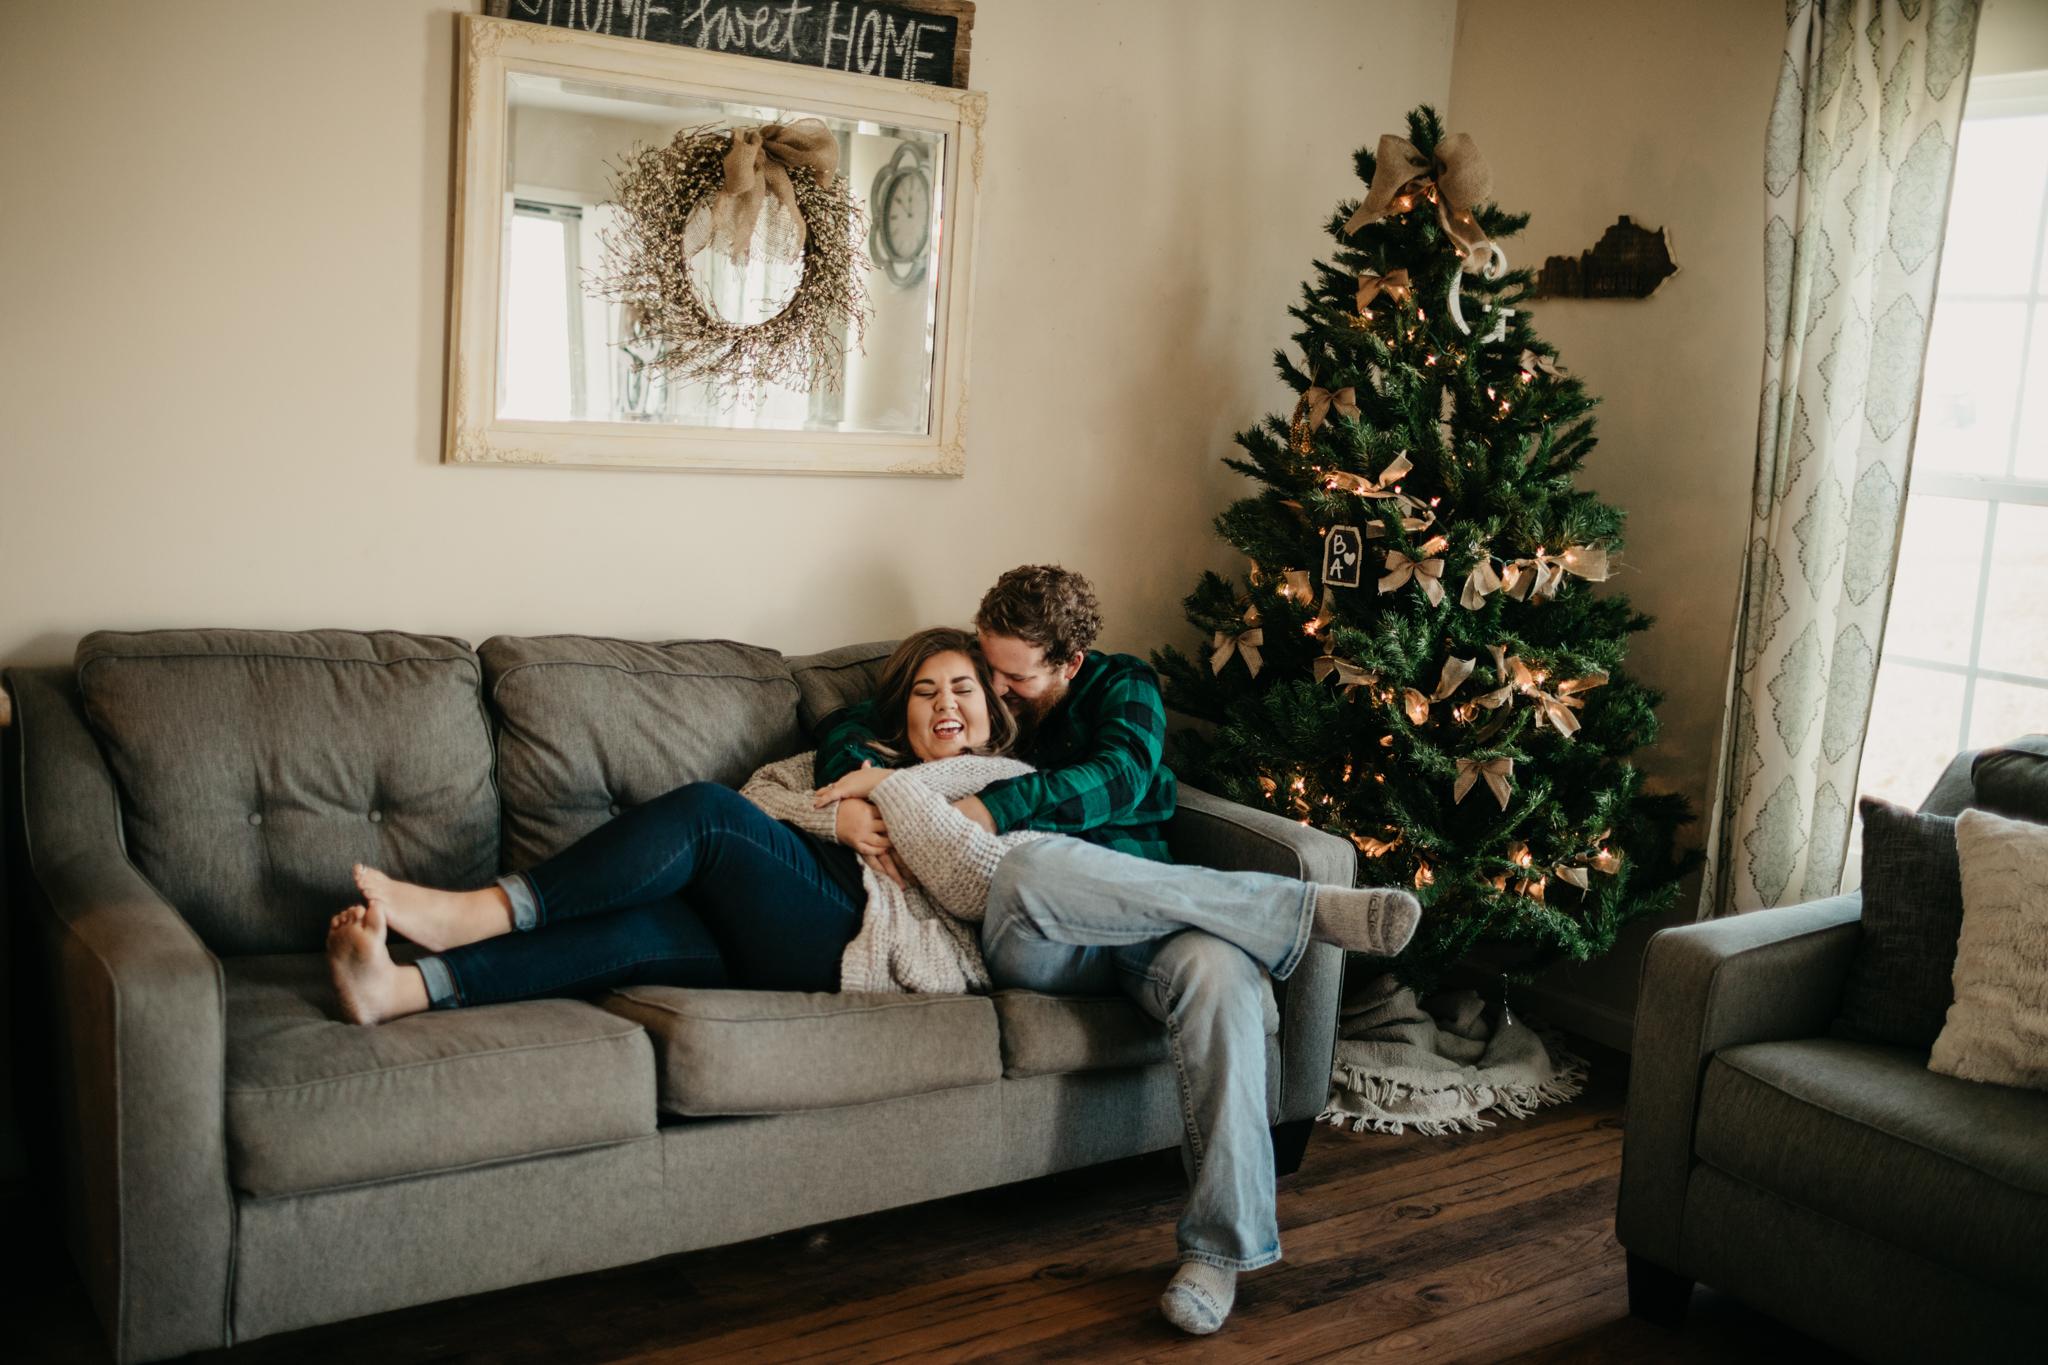 billie-shaye-style-photography-www.billieshayestyle.com-lifestyle-couple-christmas-cuddle-session-nashville-tennessee-8480.jpg